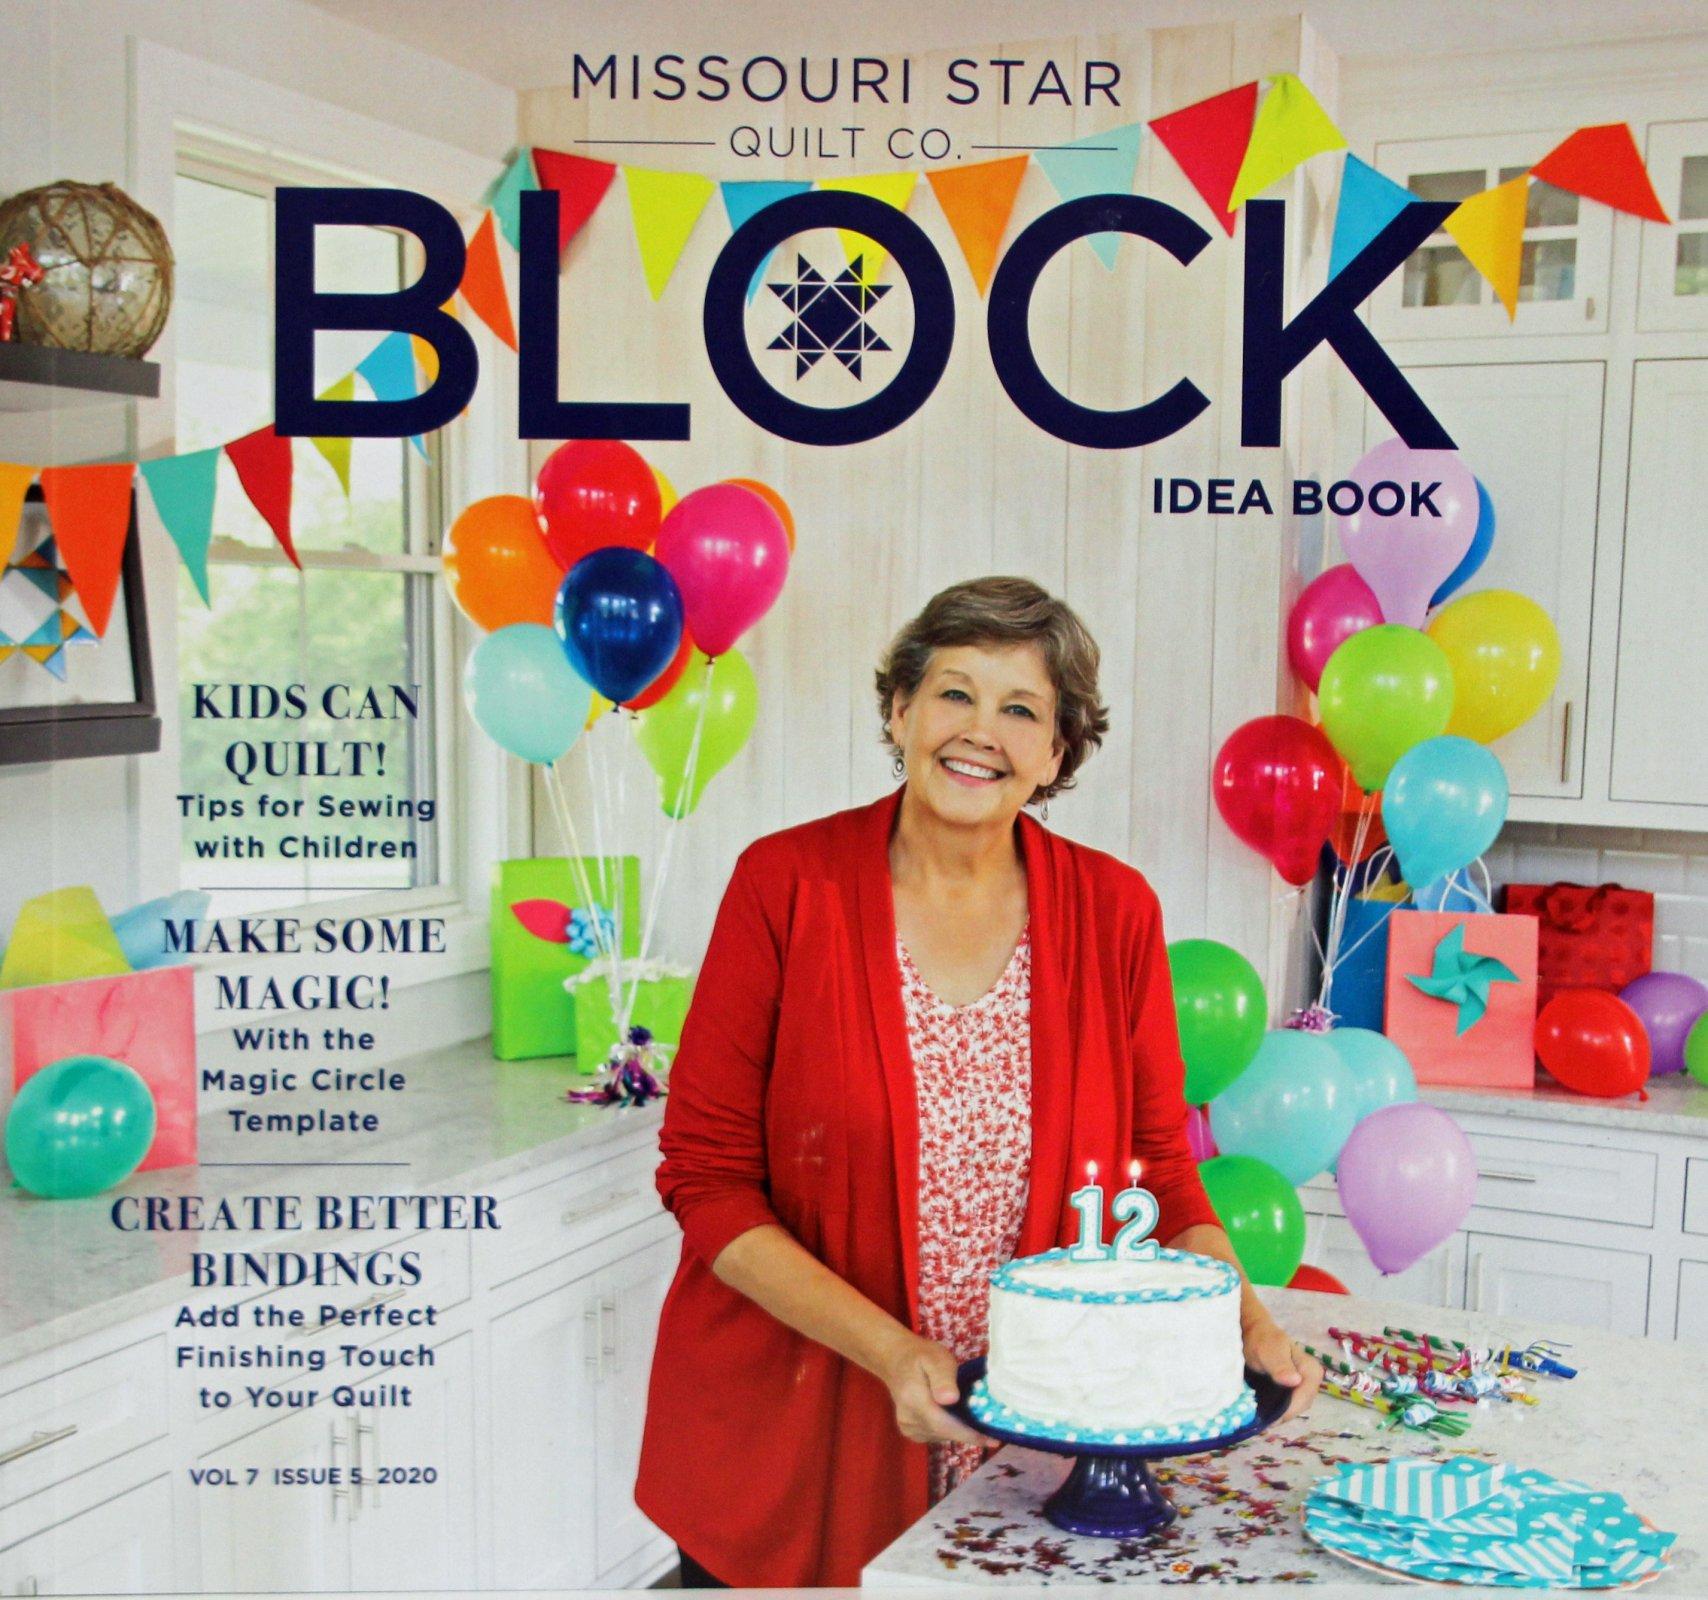 Block Idea Book, vol. 7, issue 5 2020